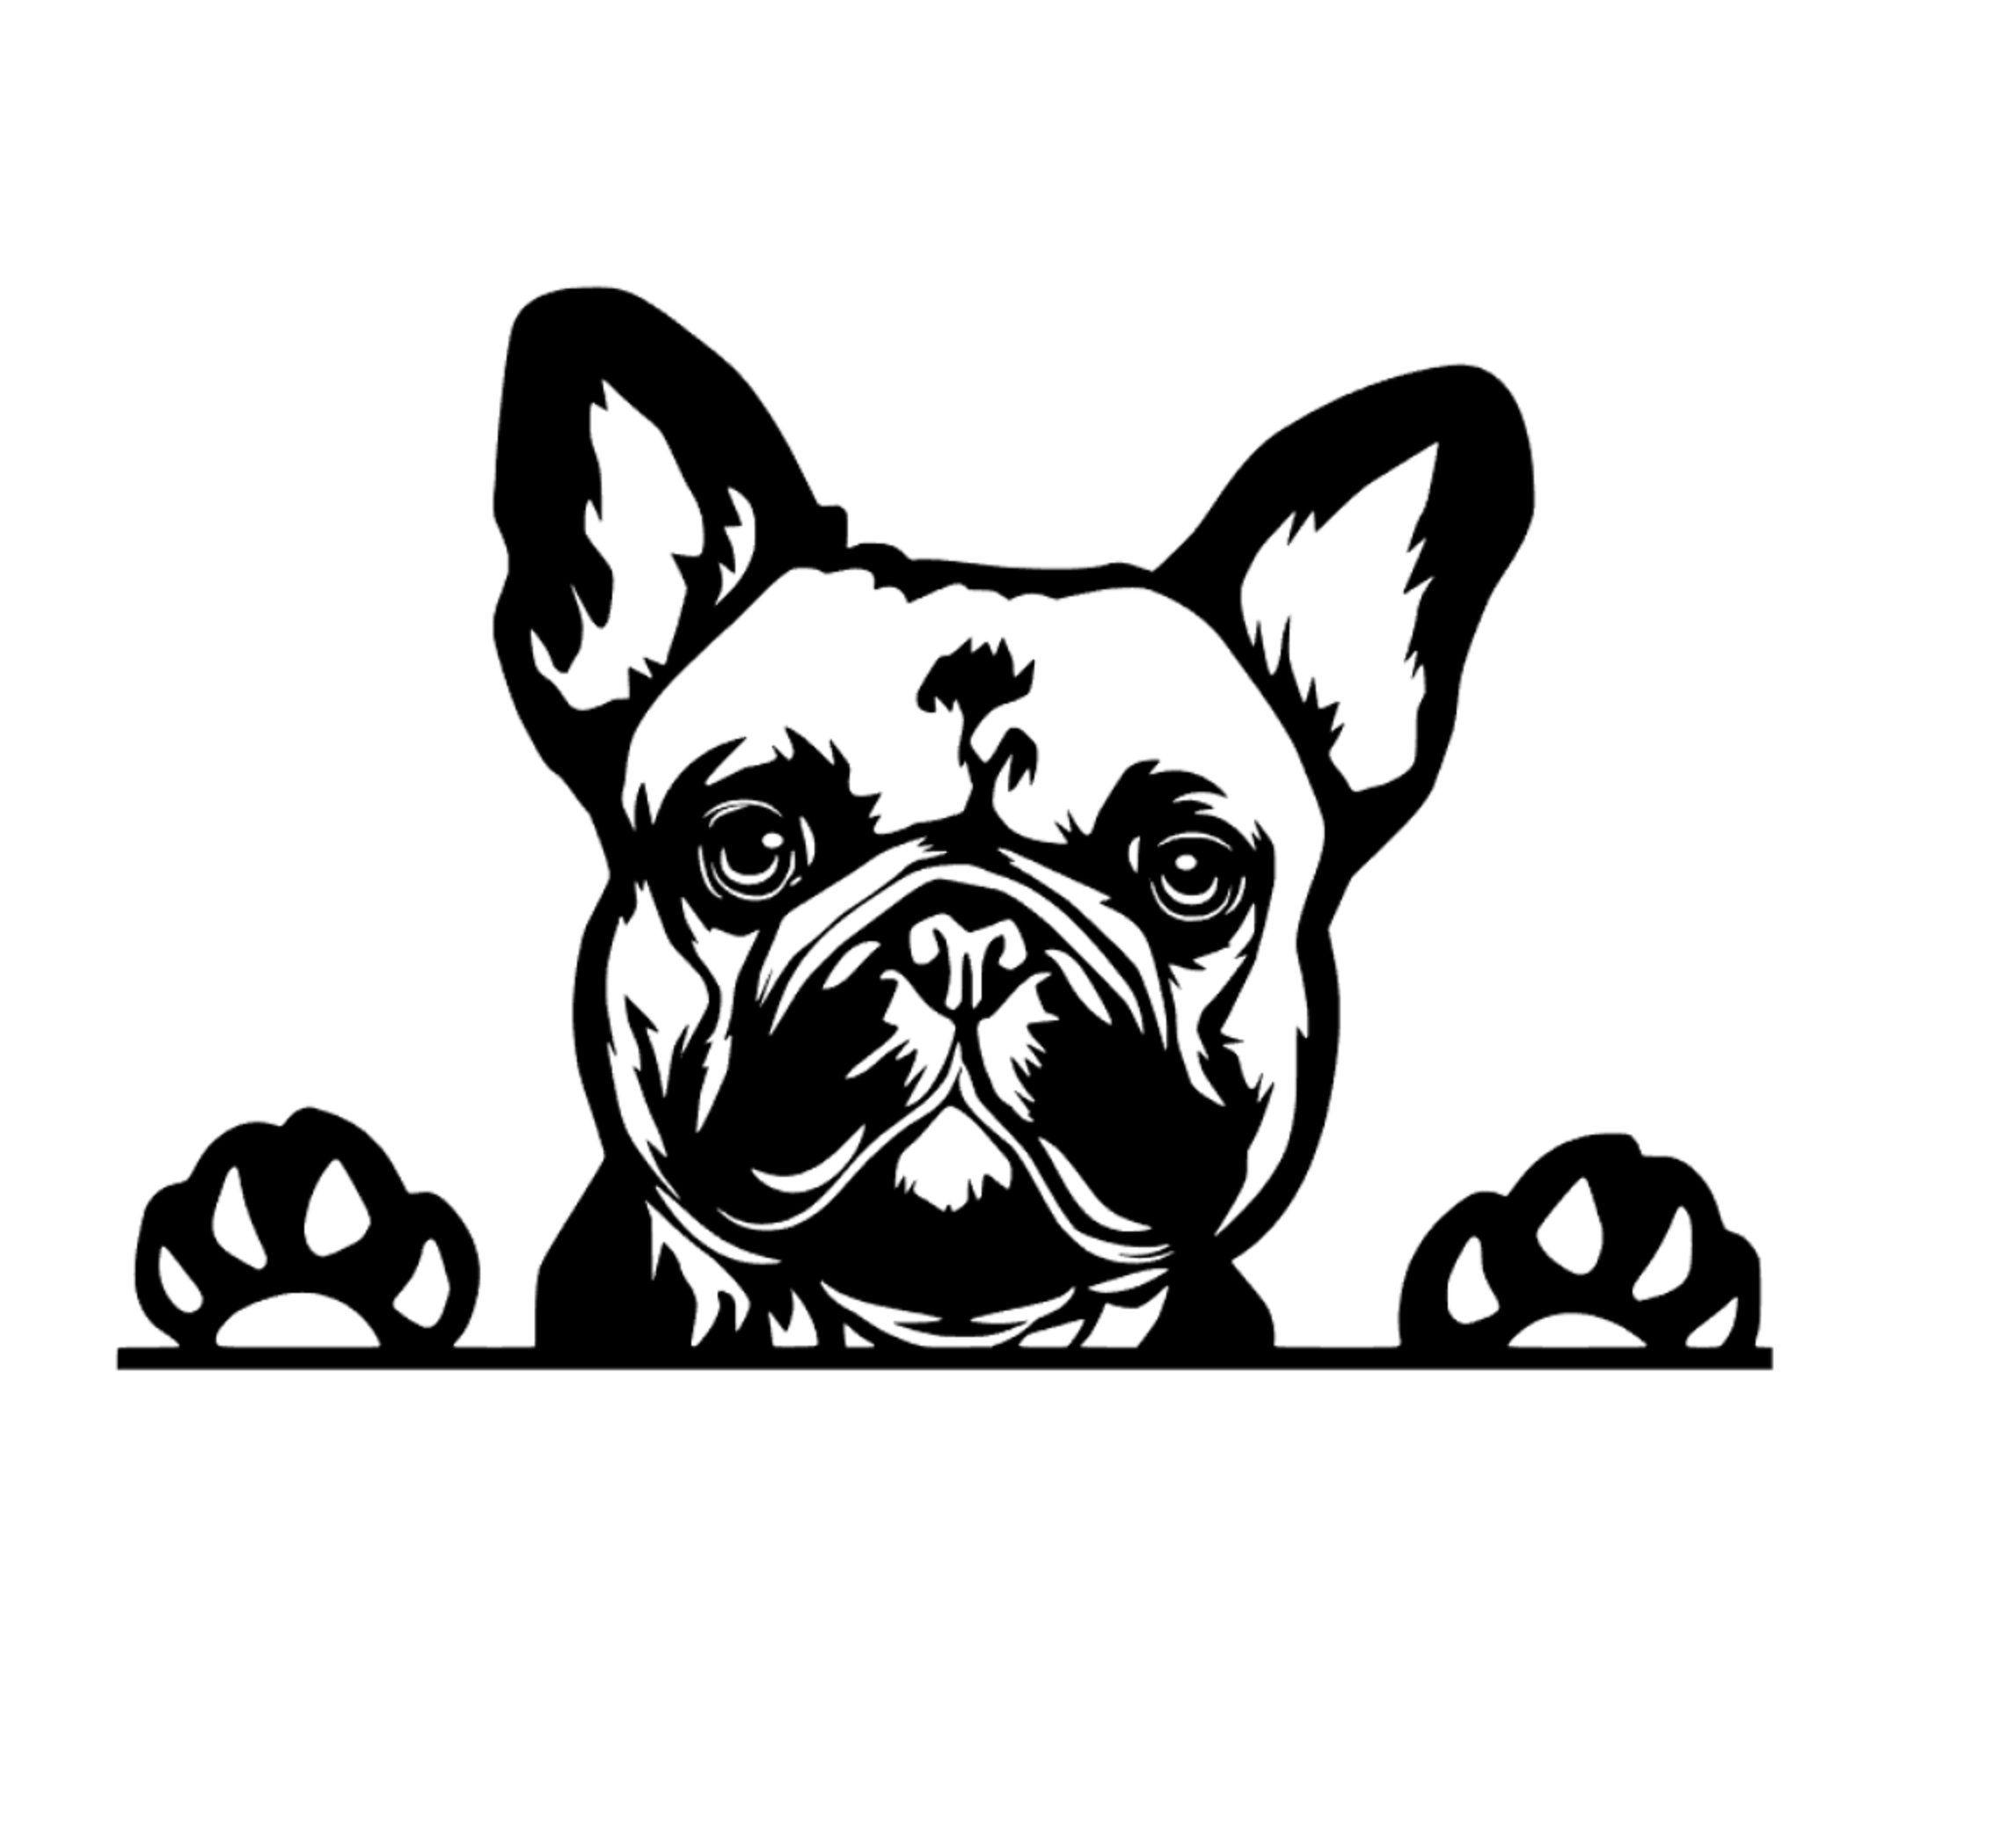 French Bulldog Car Decal Sticker Frenchie Dog Sticker Vinyl Window Ute Cute Fun Dog Love Frenchies French Bulldog Gifts Frenchie Gifts In 2020 French Bulldog Gifts French Bulldog Bulldog